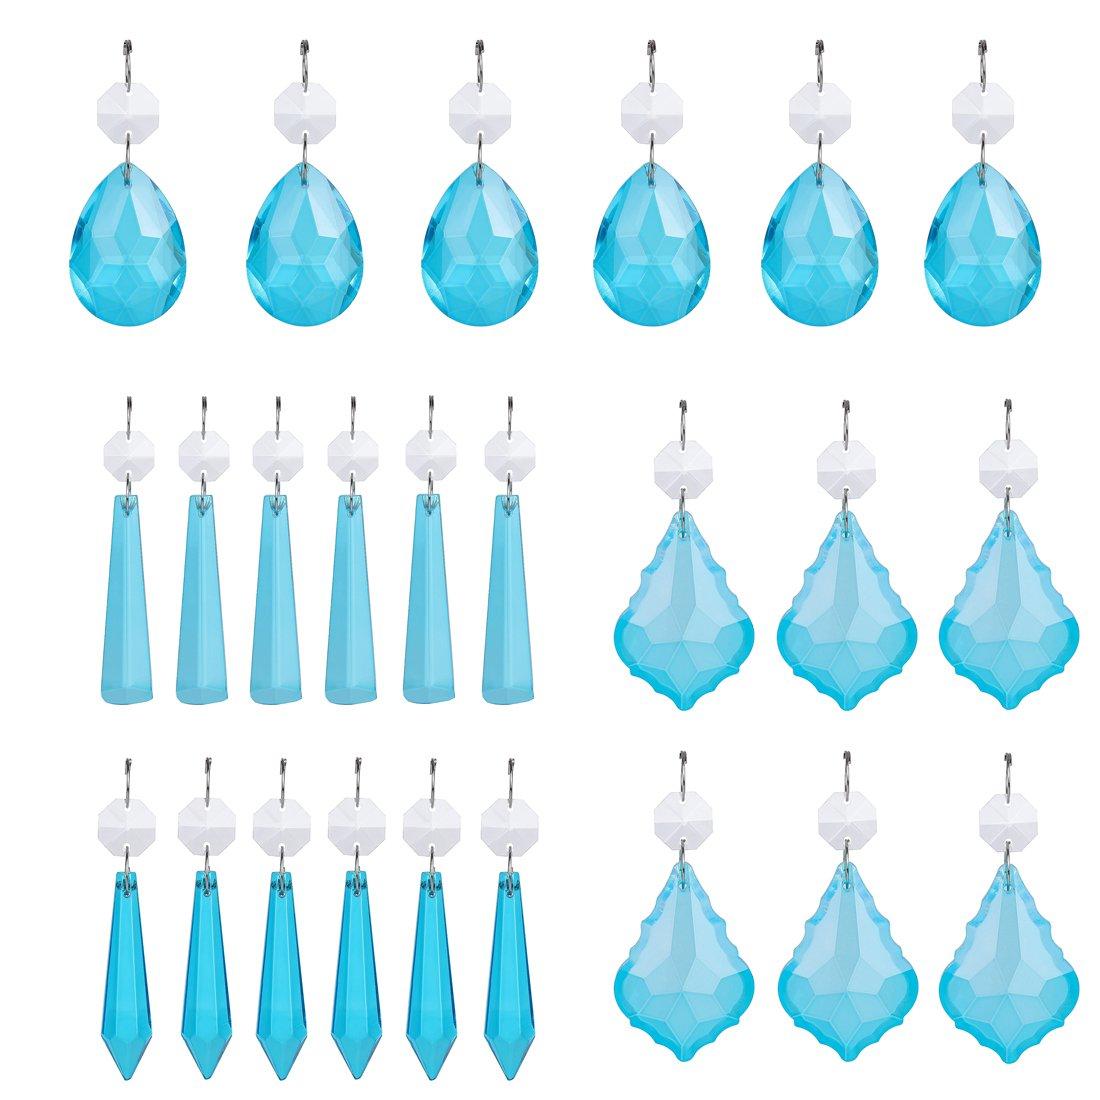 H&D 24pcs Sky Blue Crystal Beads Drop Pendants Chandelier Curtain Lamp Chain Prisms for Wedding Party Centerpieces Decoration